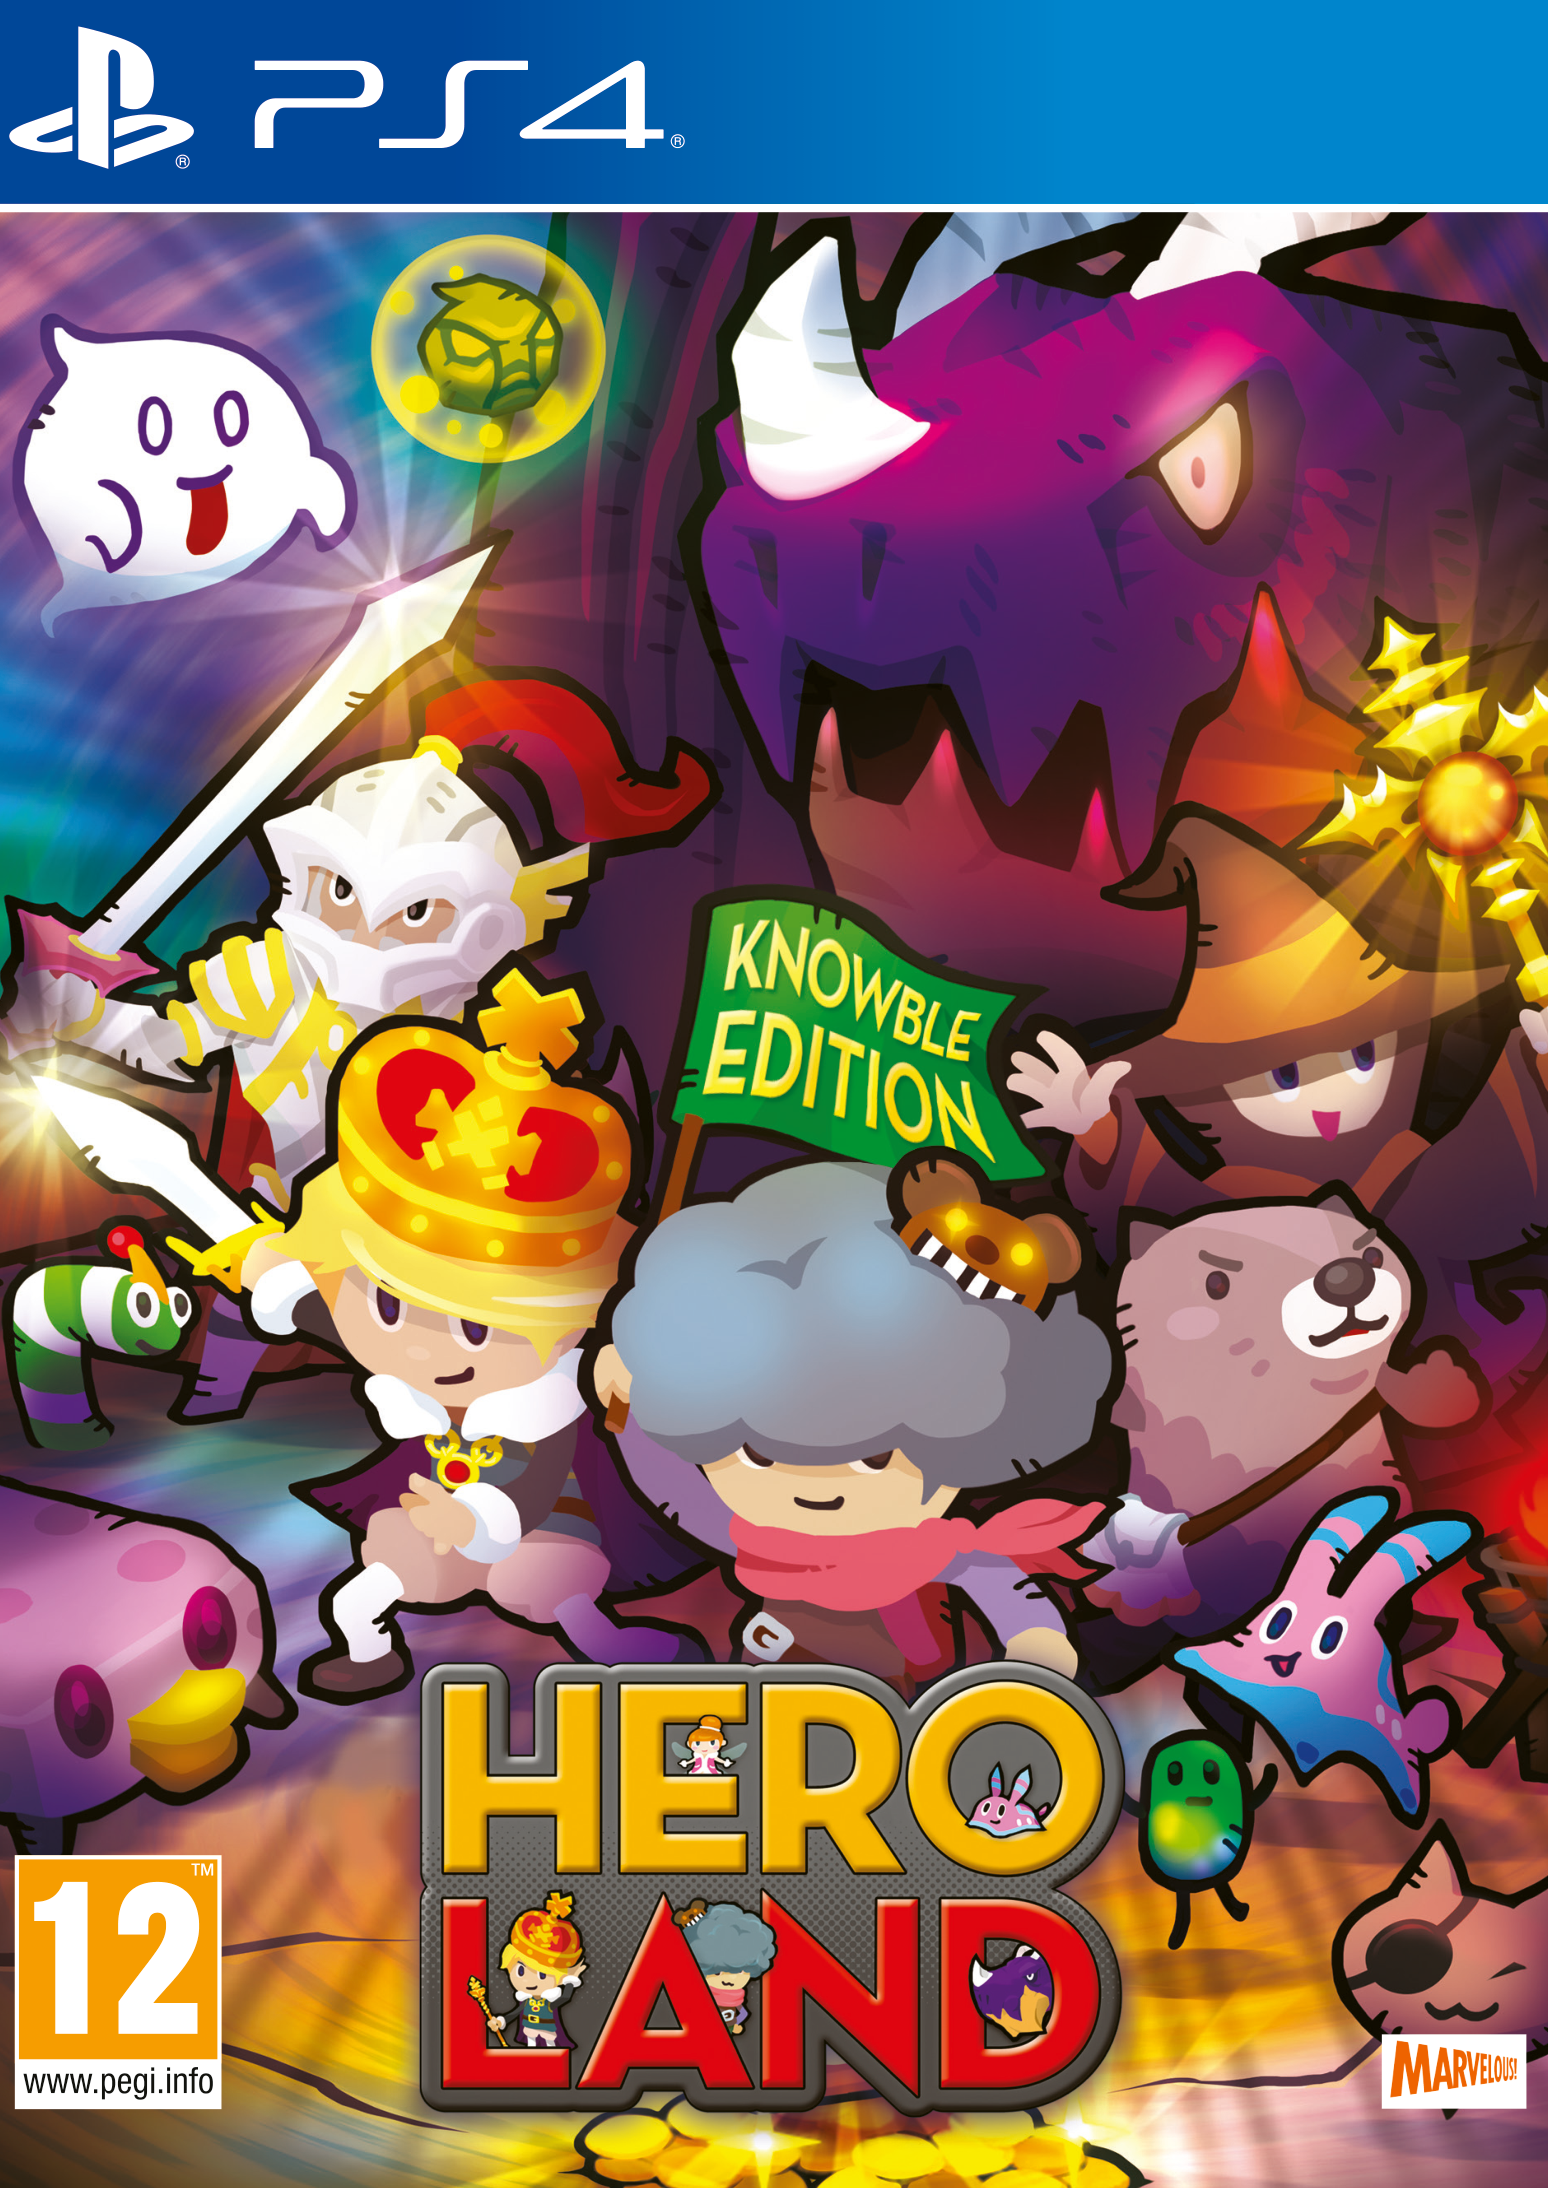 Heroland (Knowble Edition)